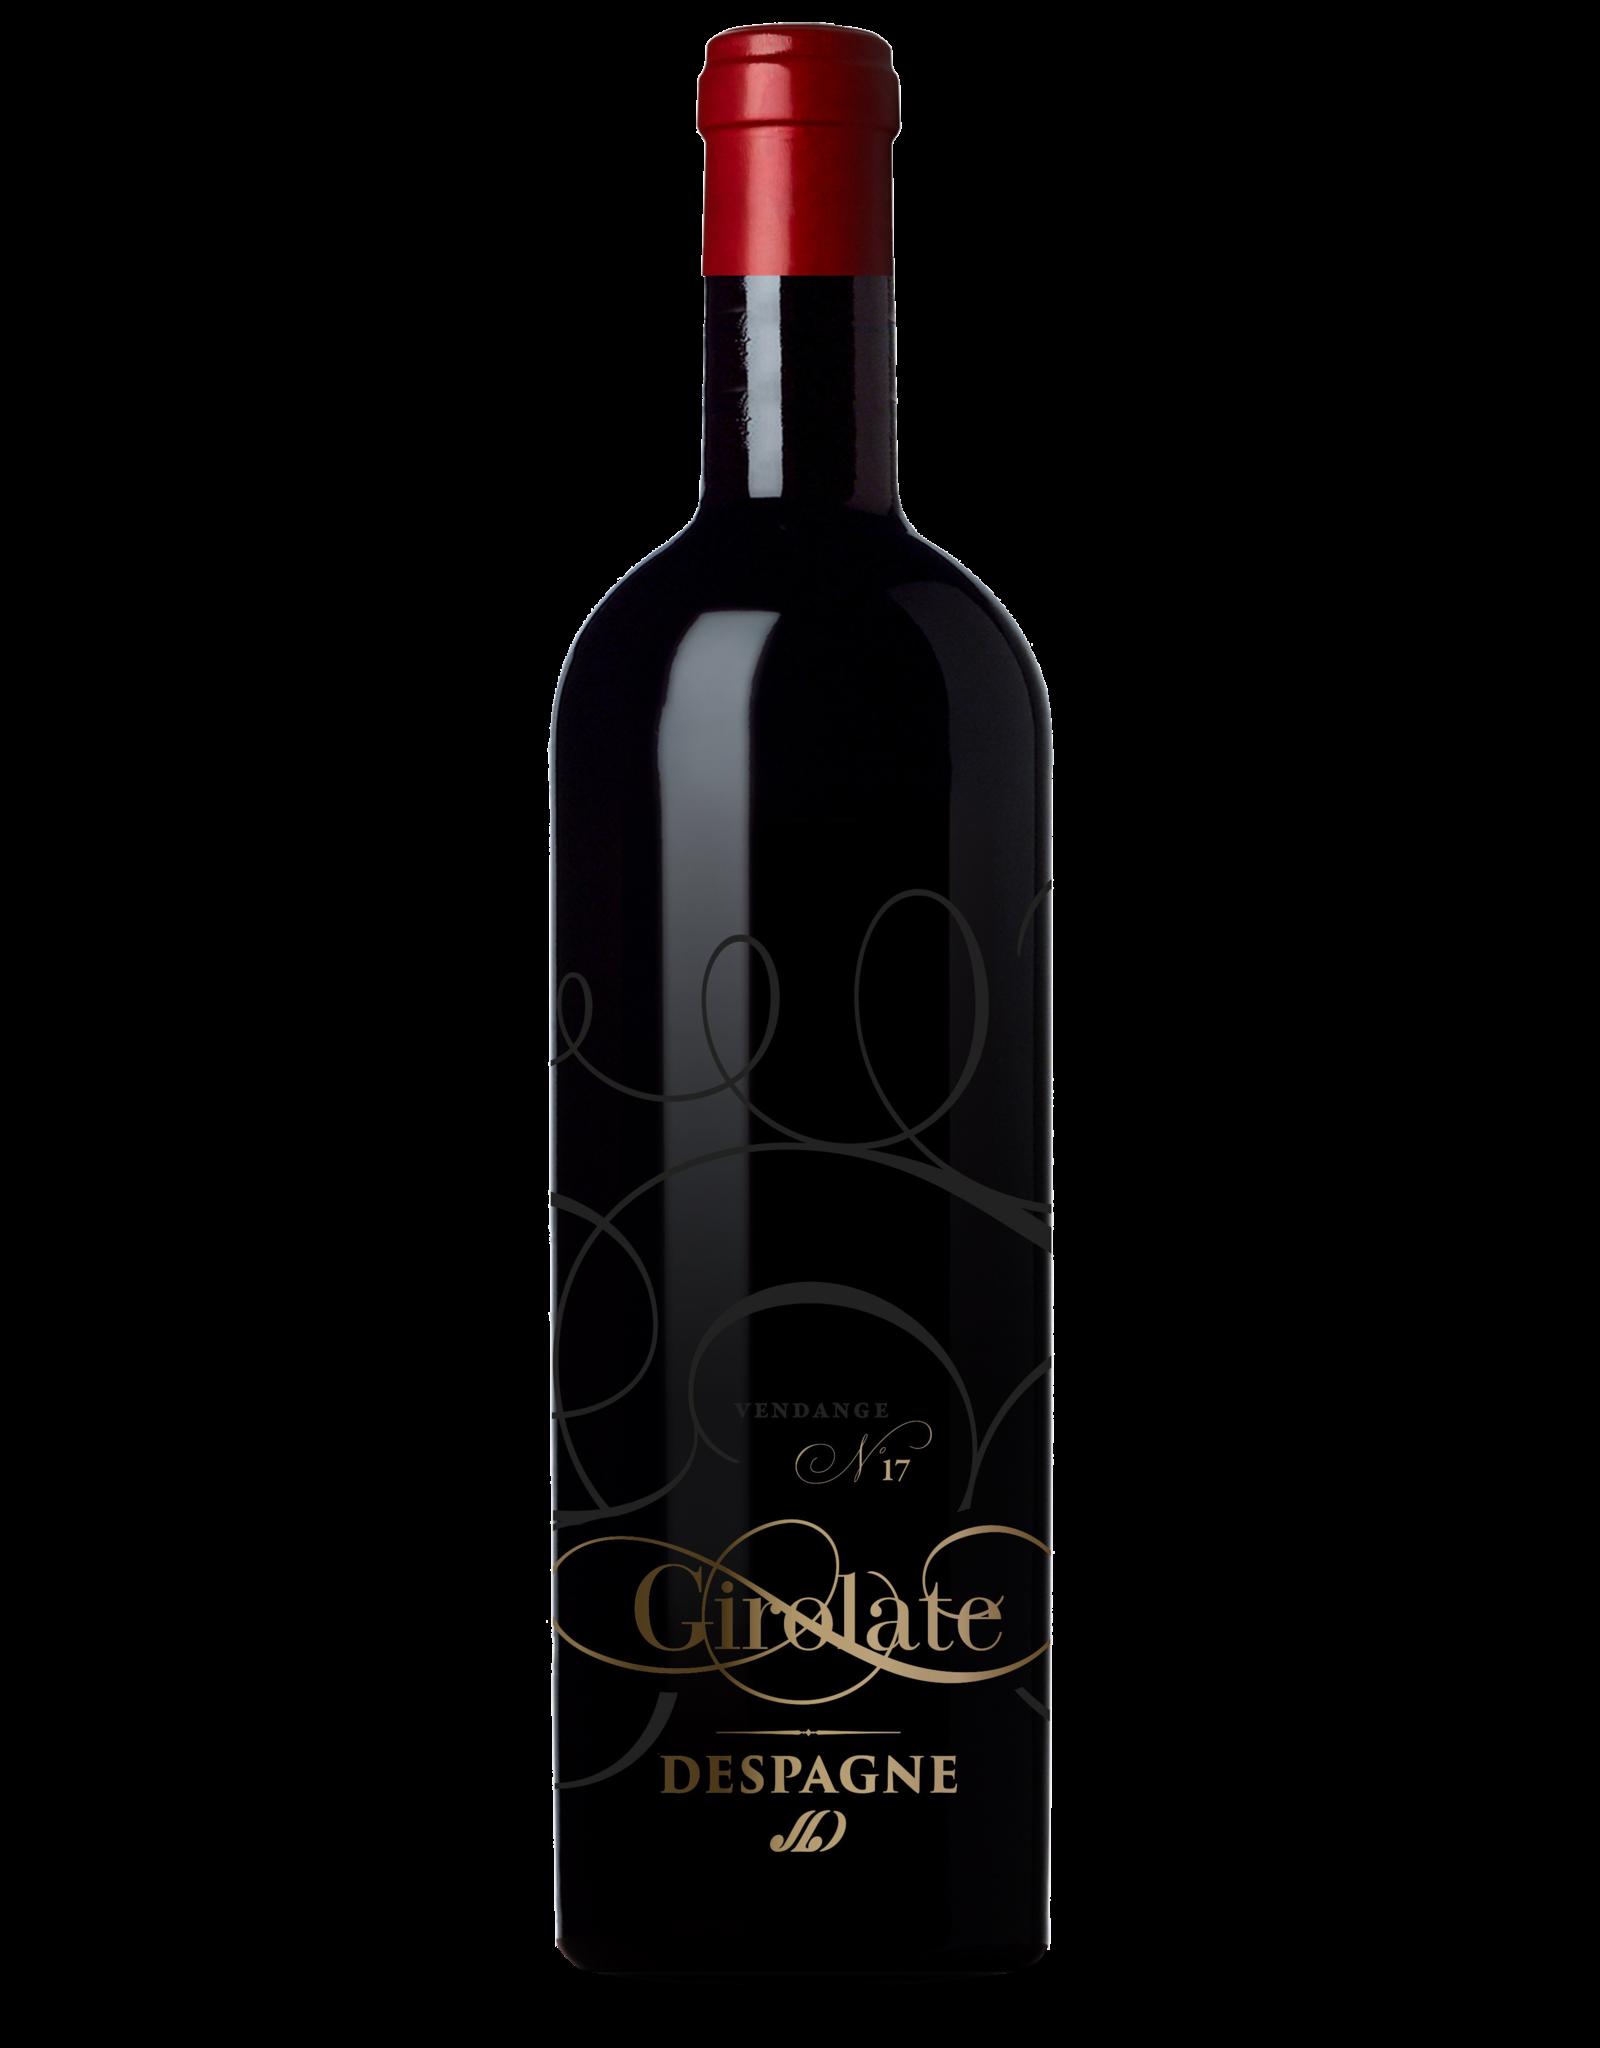 Château Rauzan Despagne Girolate Rouge 2017 - Bordeaux